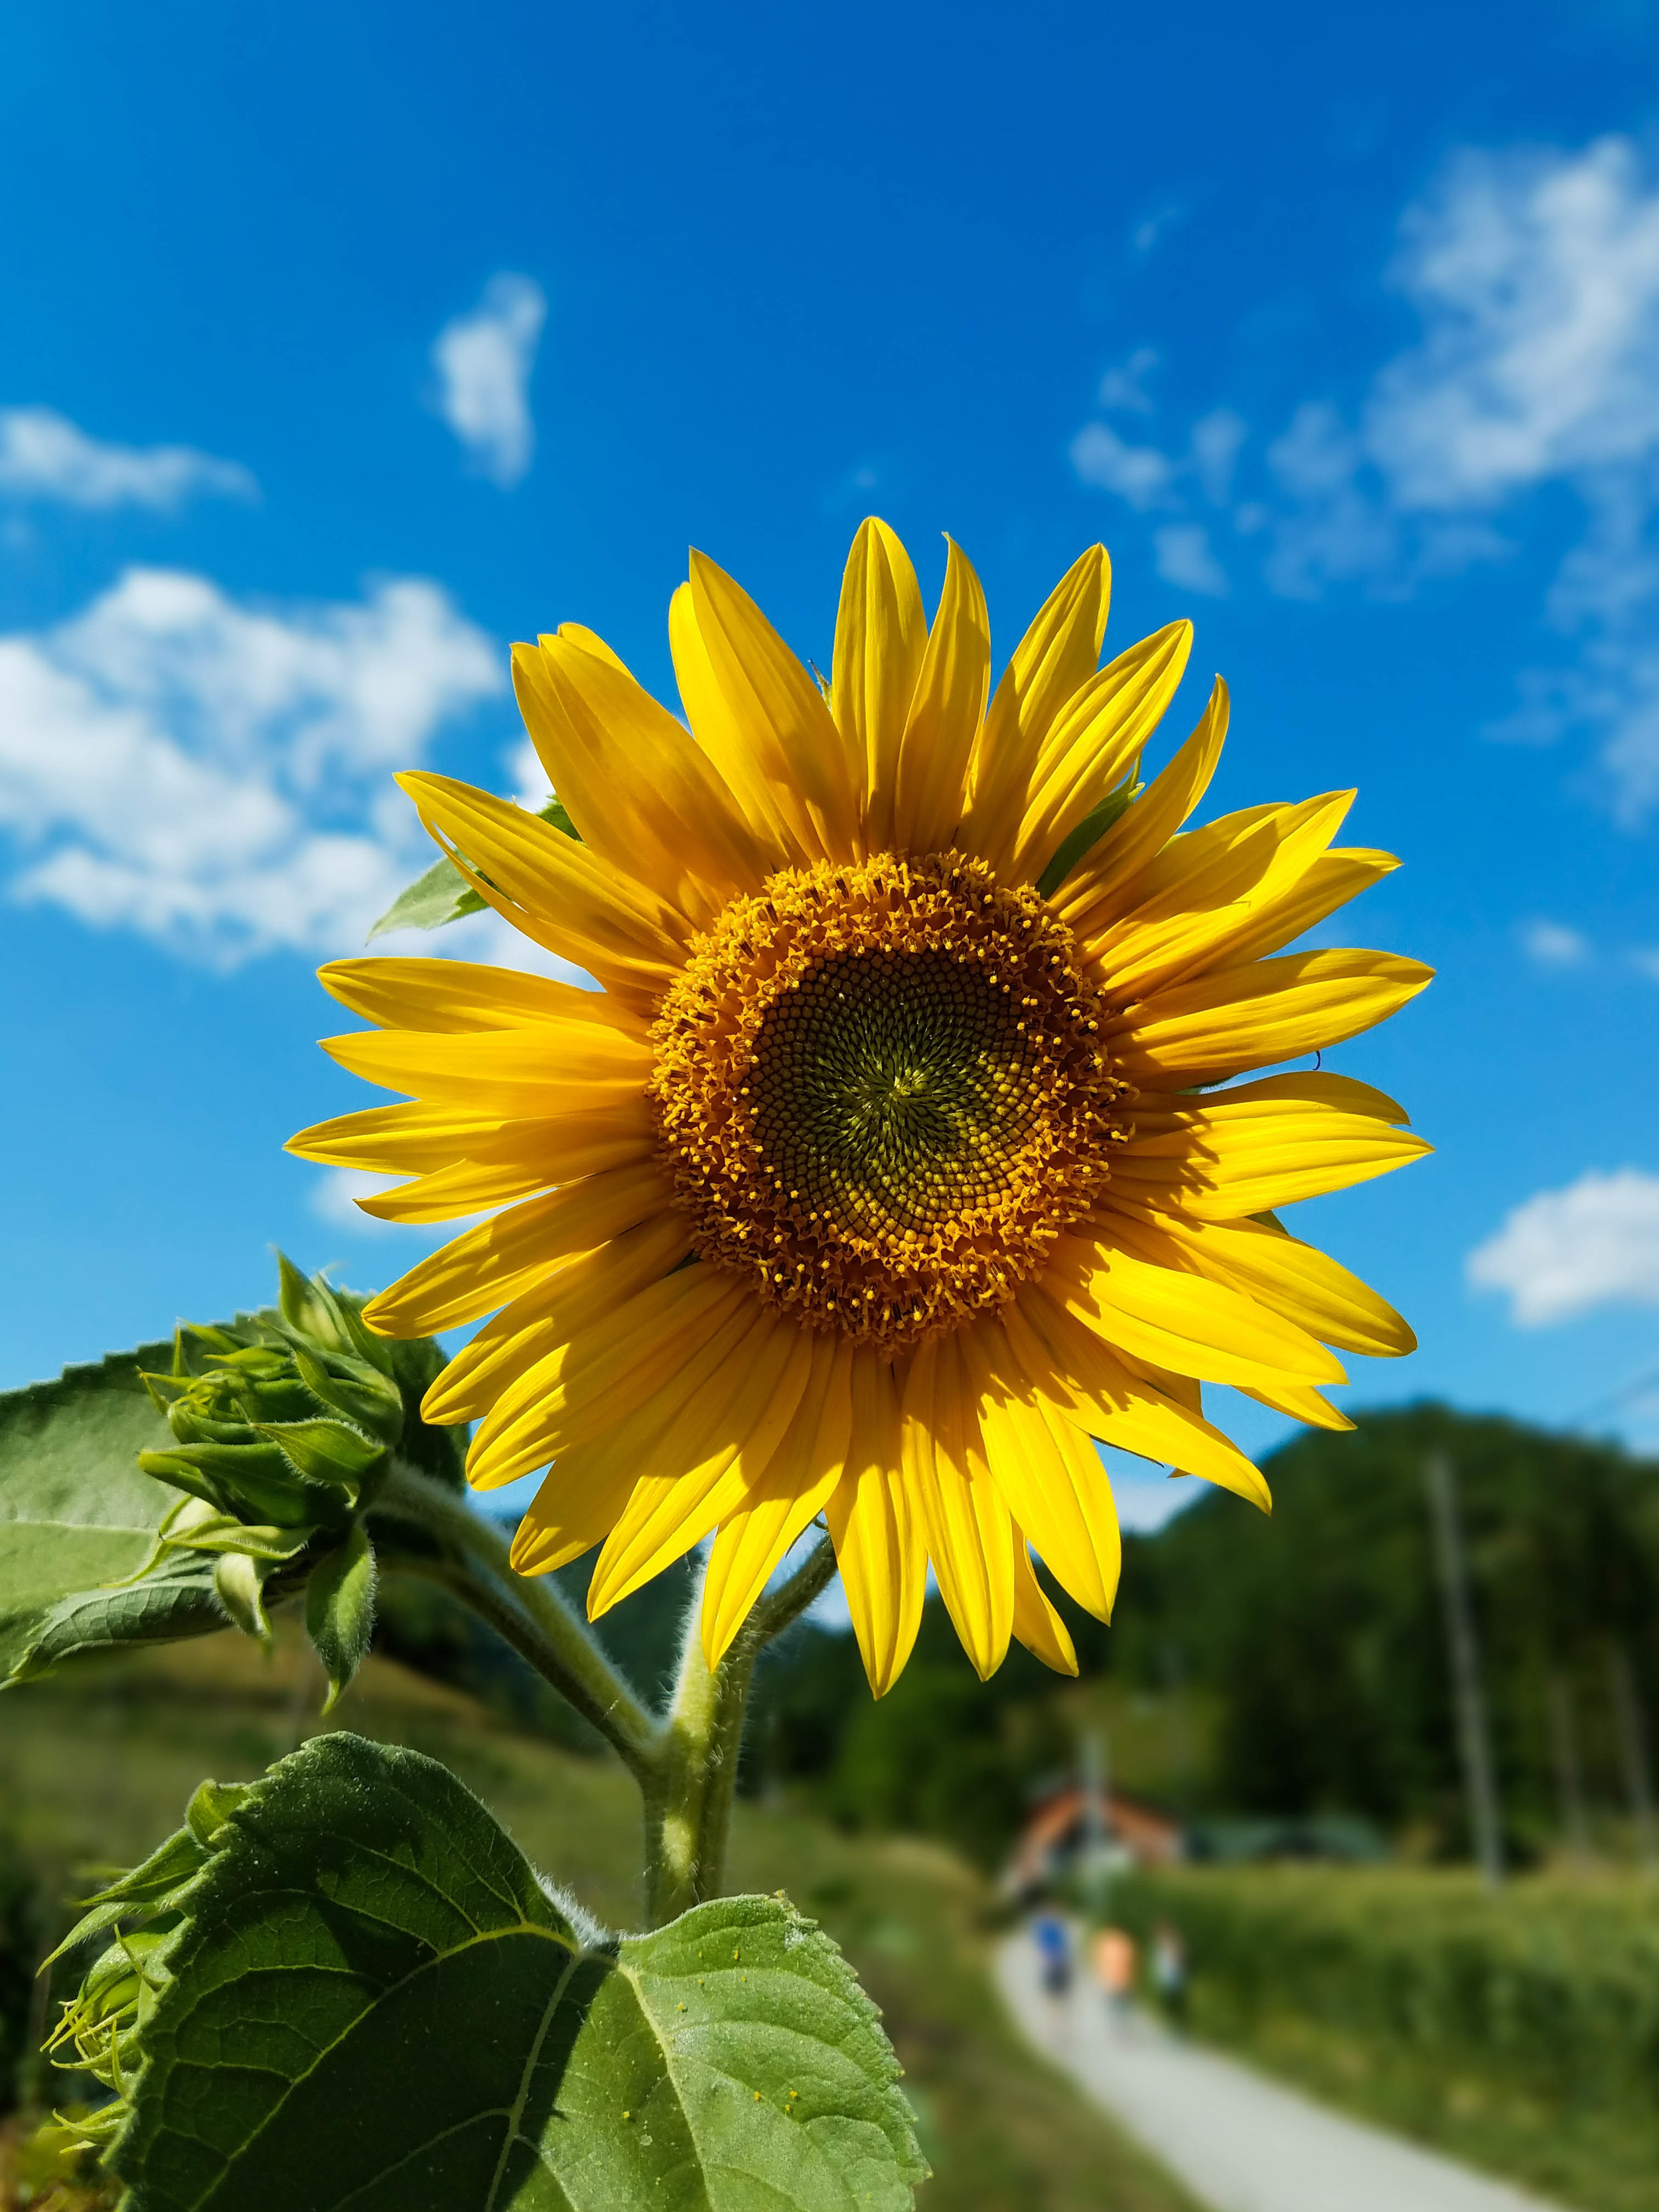 A sunflower in the fields